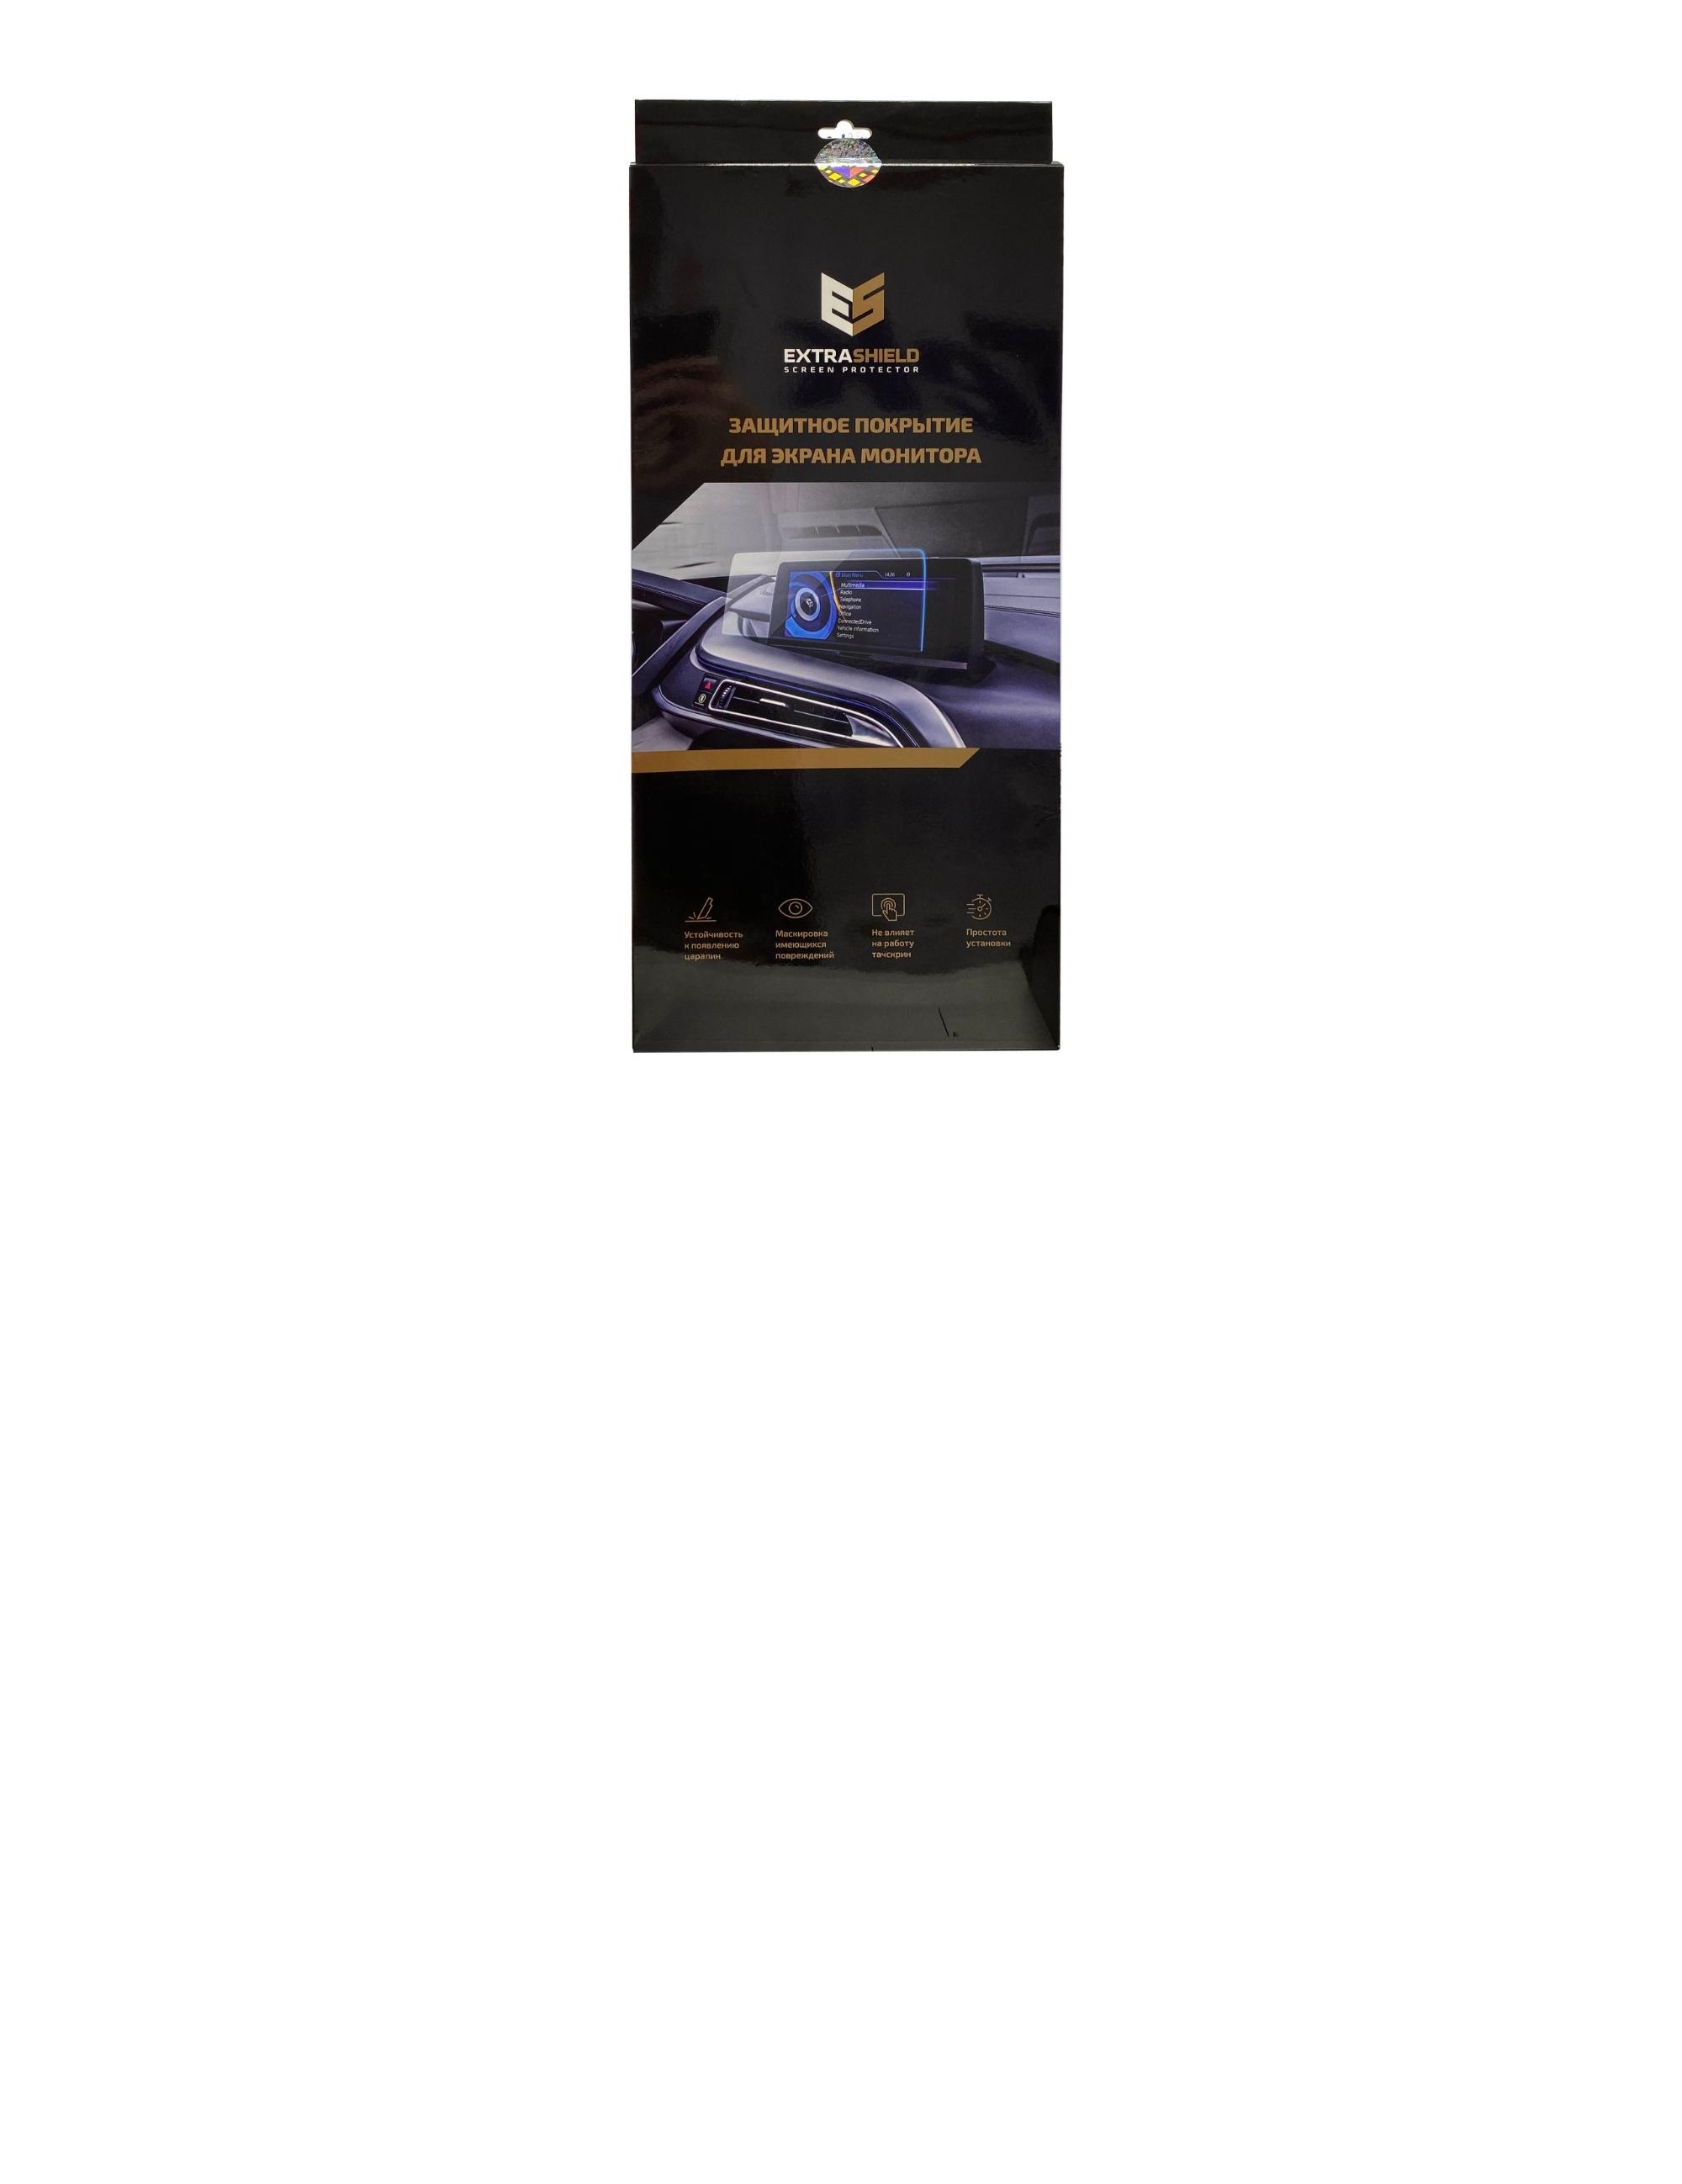 Mercedes-Benz GLE (W166) GLS (X166) 2015 - 2019 мультимедиа 8 Защитное стекло Матовая